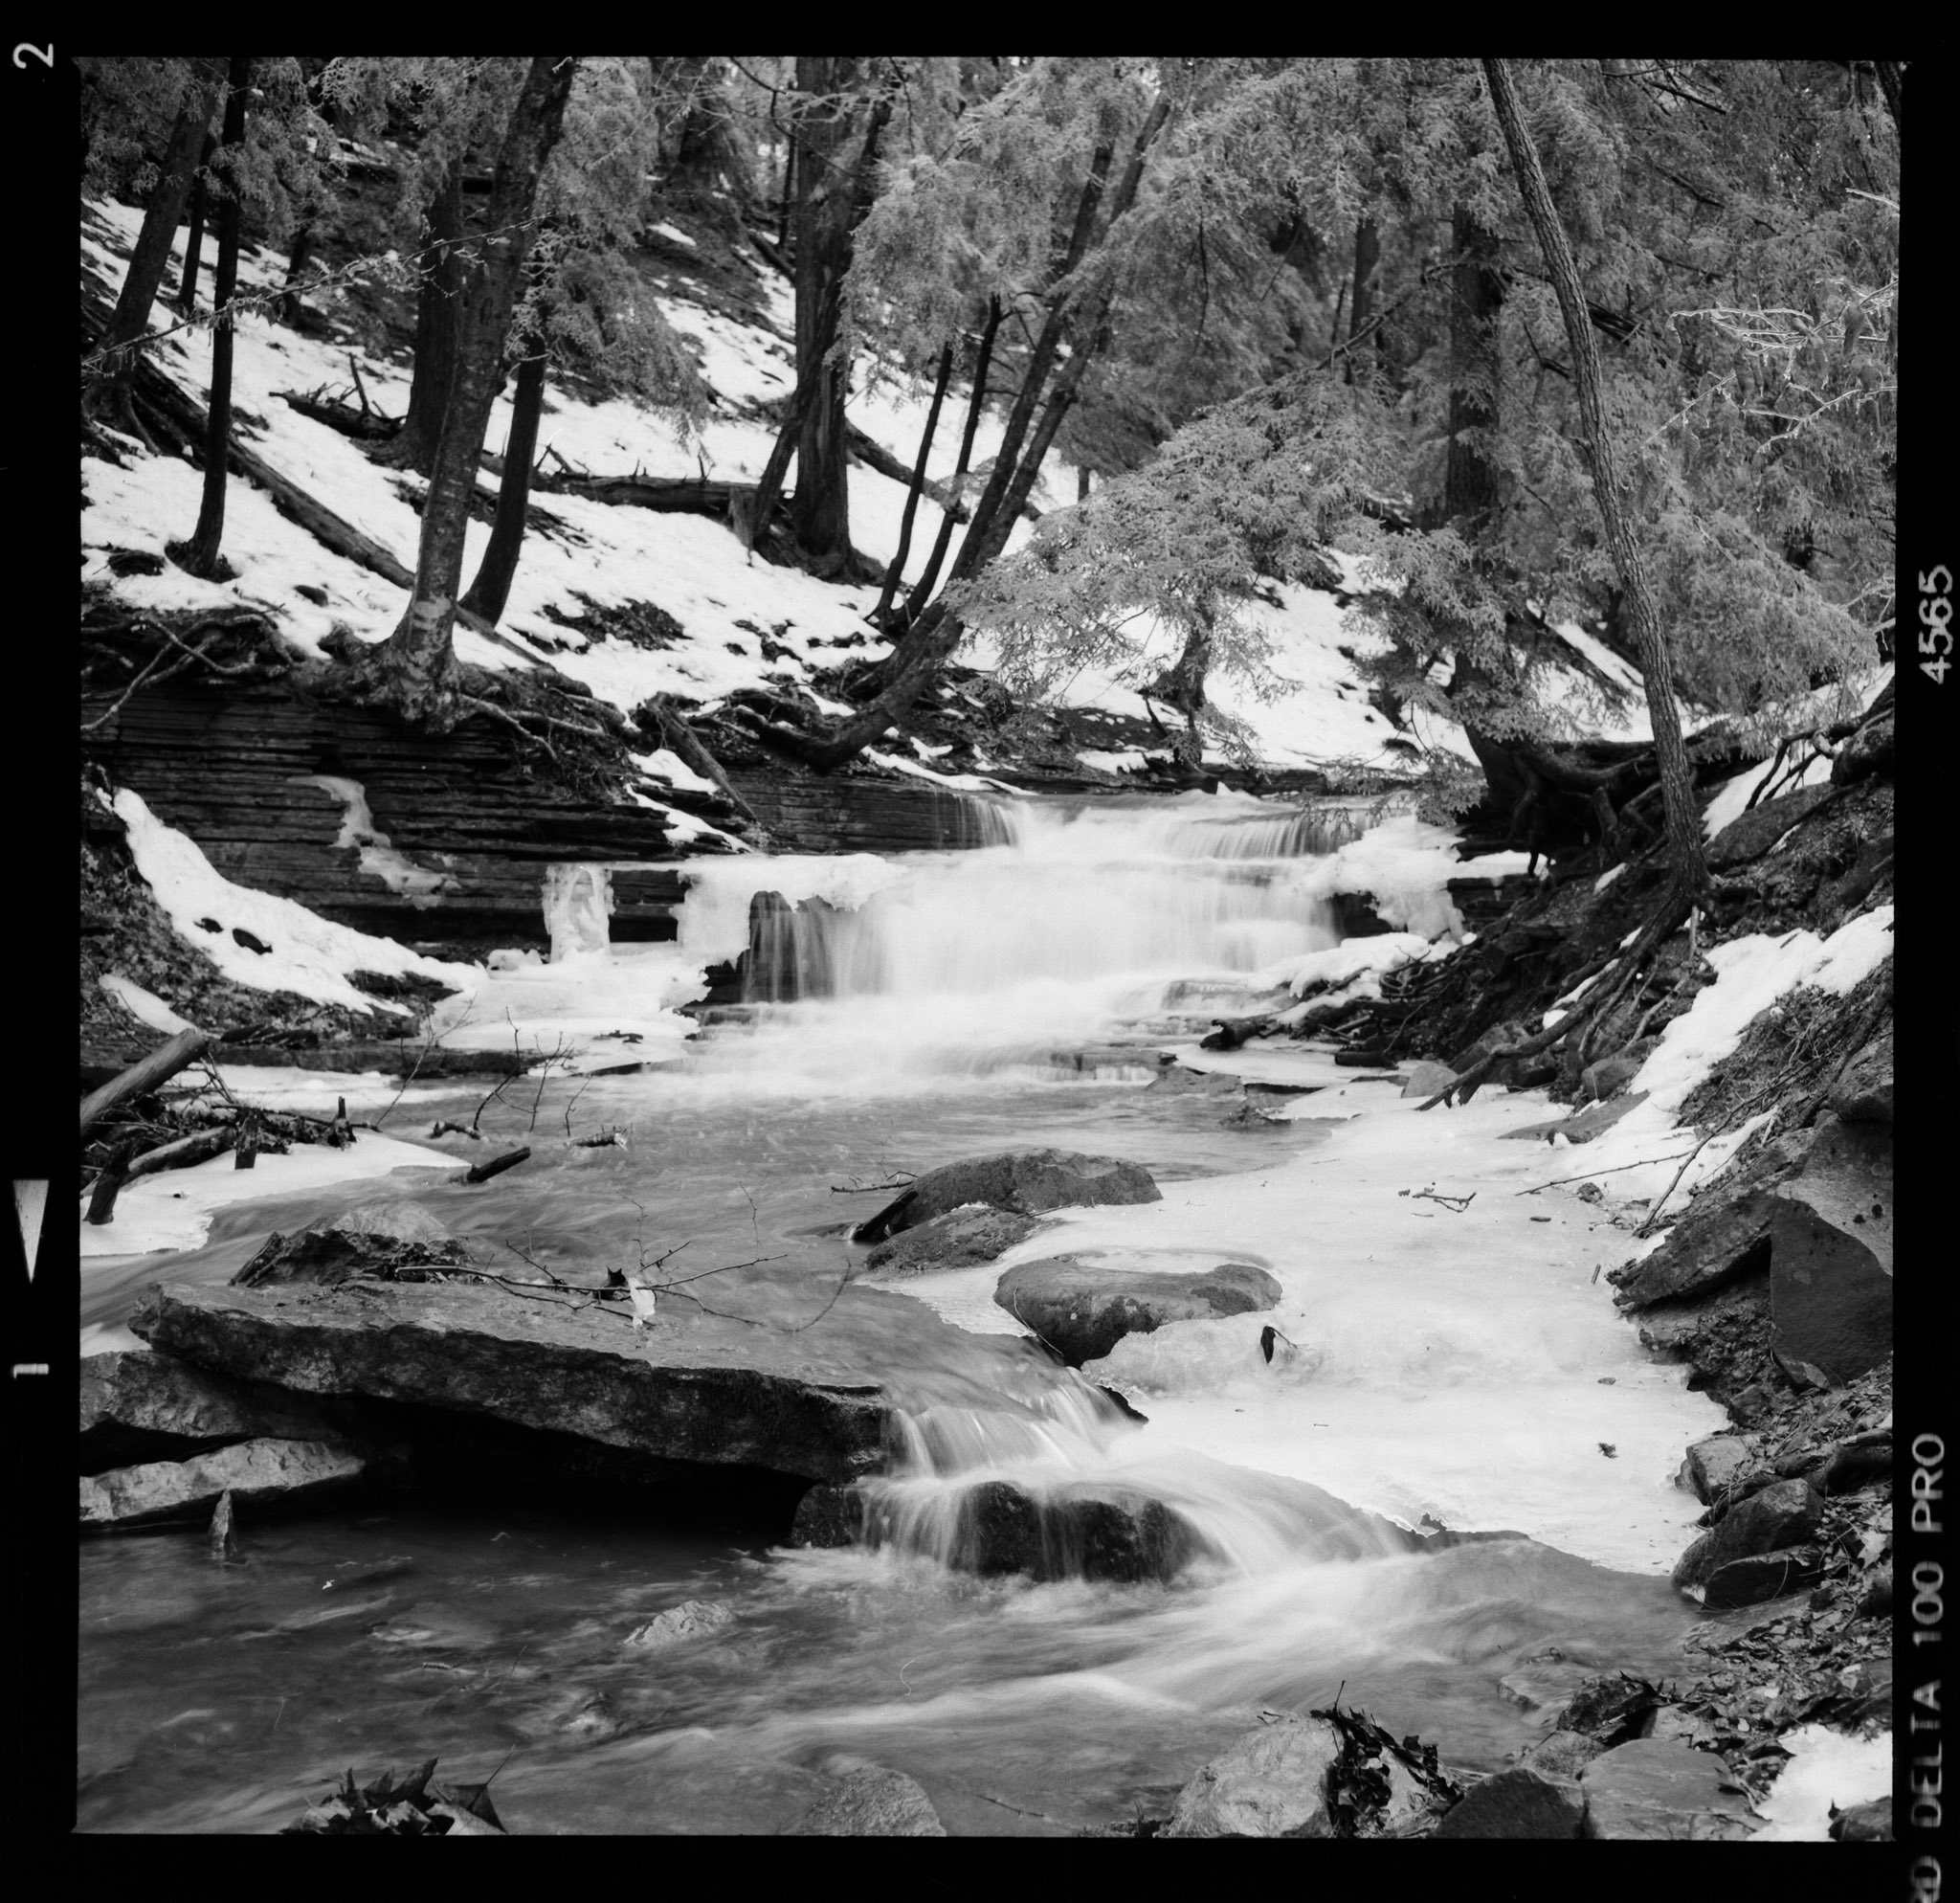 @MattAngleyPhoto · 16h Forest Stream 📷 Zeiss Ikoflex 1C + 75mm f/3.5 Carl Zeiss Tessar 🎞 Ilford Delta 100 #landscapephotography #blackandwhitephotography #ilfordphoto #delta100 #filmphotography #photography #mediumformat #zeiss #6x6 #fridayfavourites